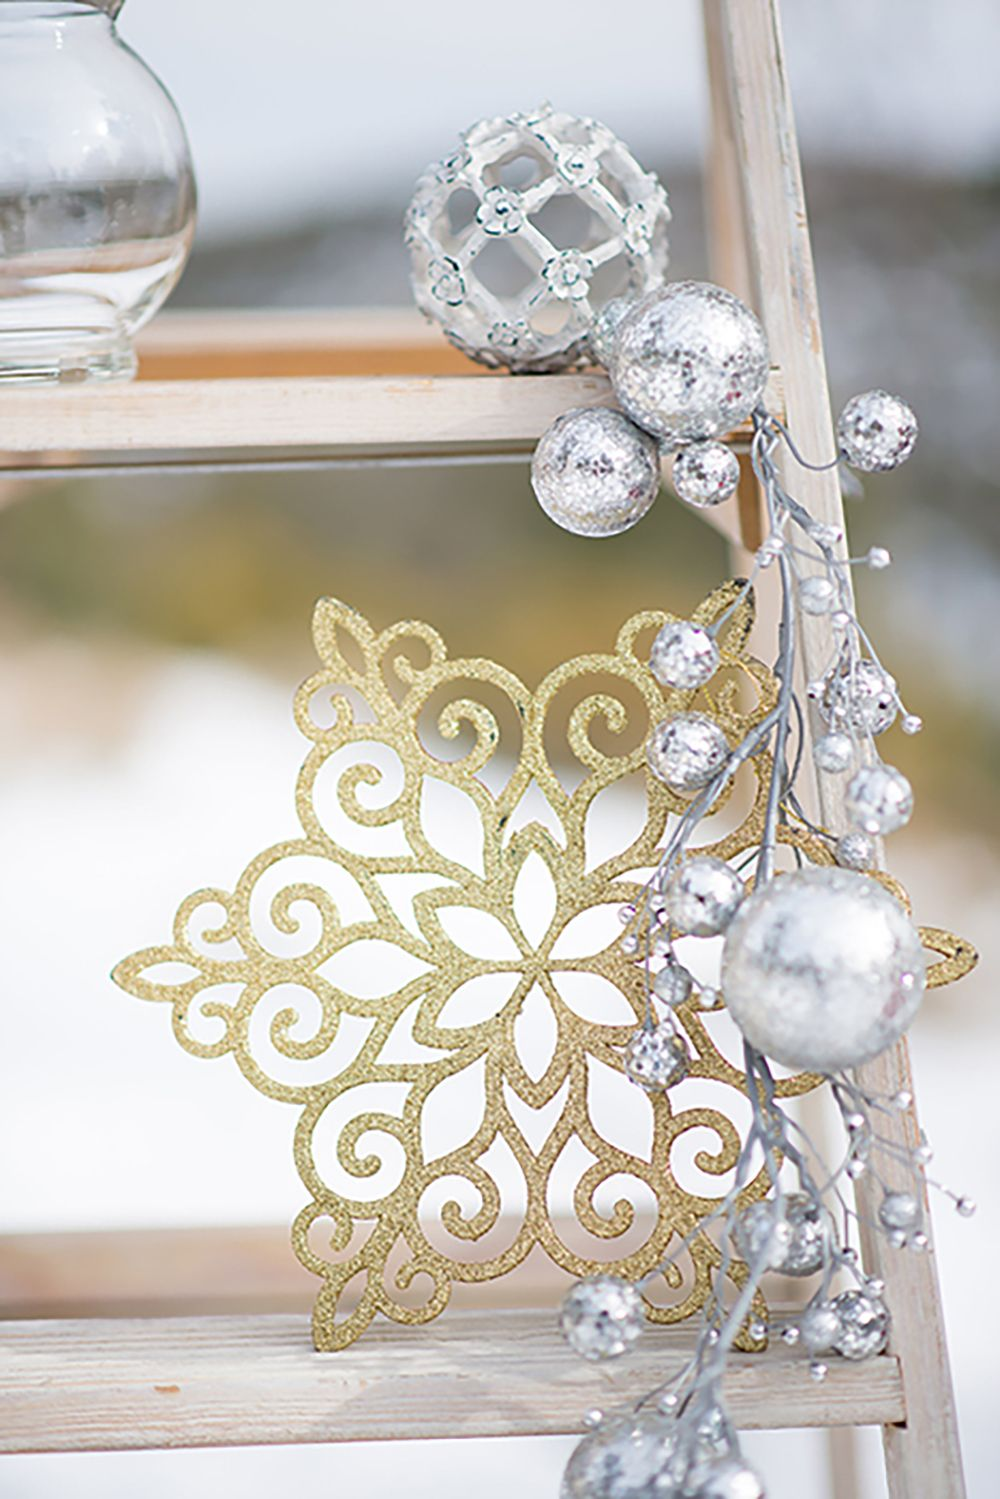 Fancy Ice Wedding Theme Embellishment - Wedding Idea 2018 ...